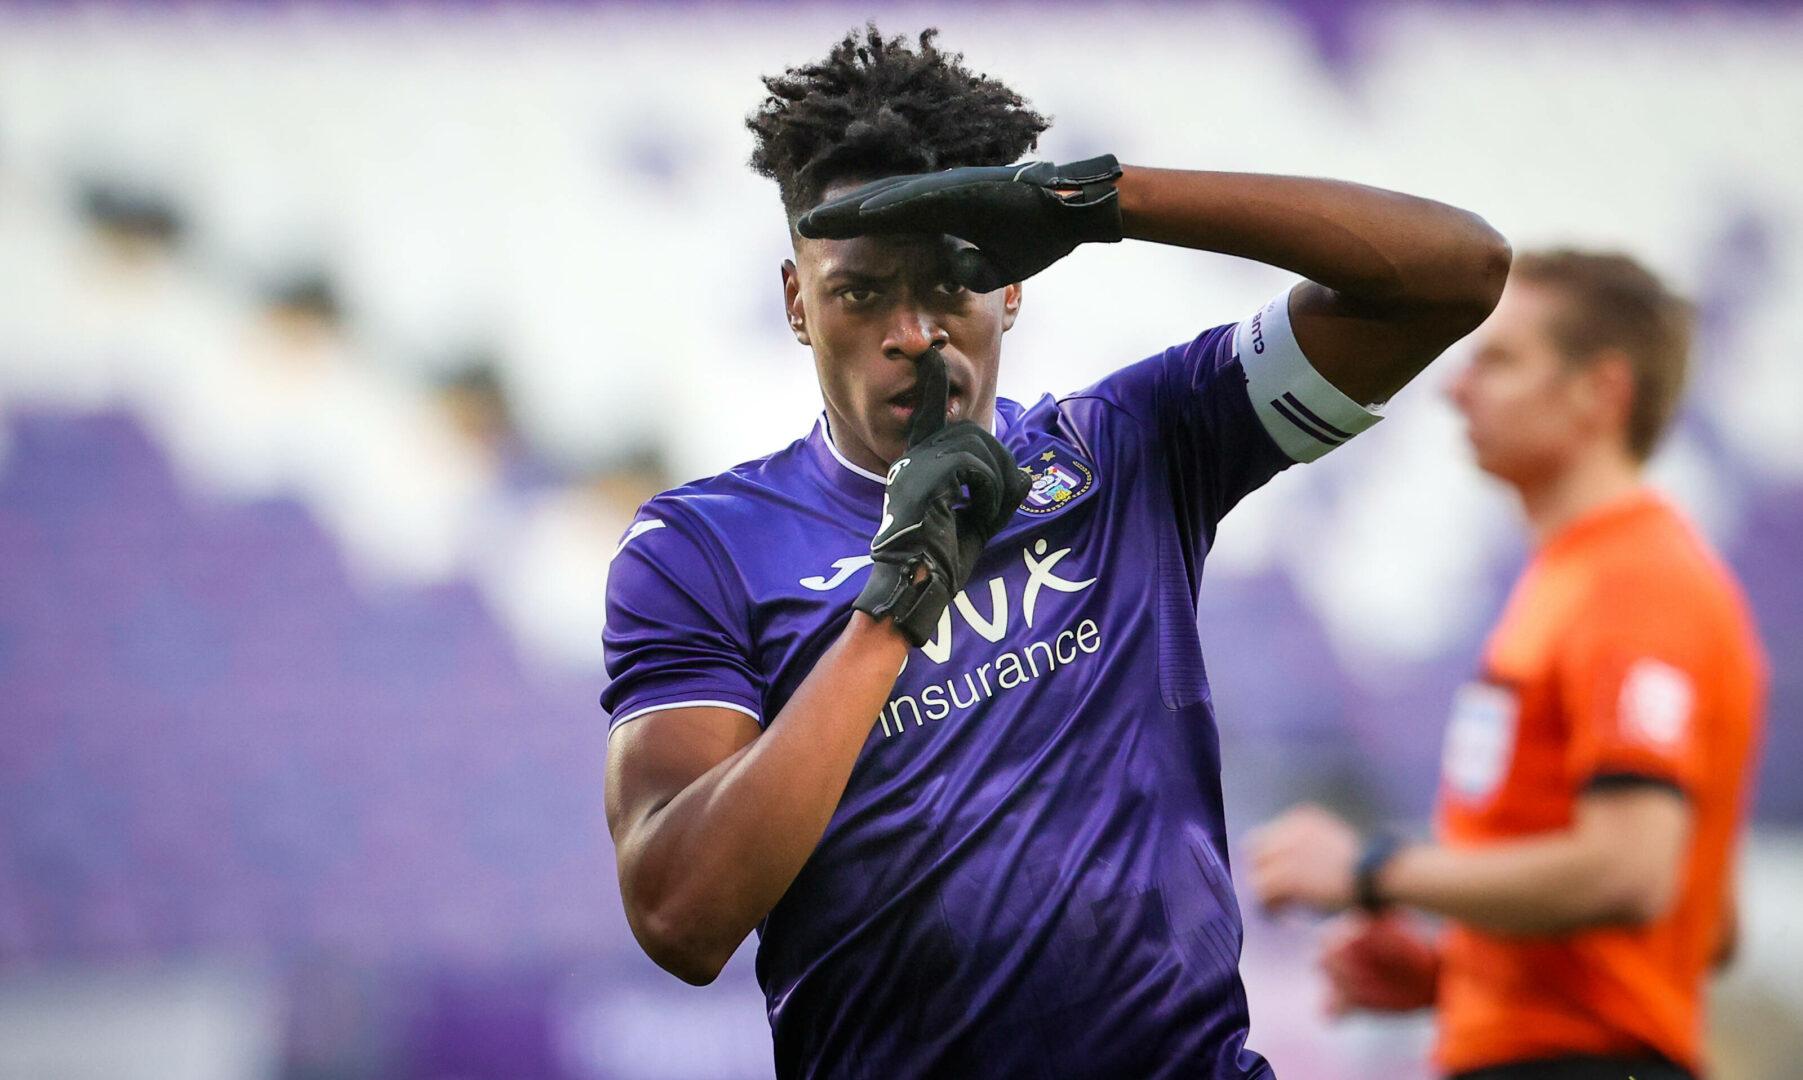 Bestätigt: Arsenal verpflichtet Albert Sambi Lokonga vom RSC Anderlecht